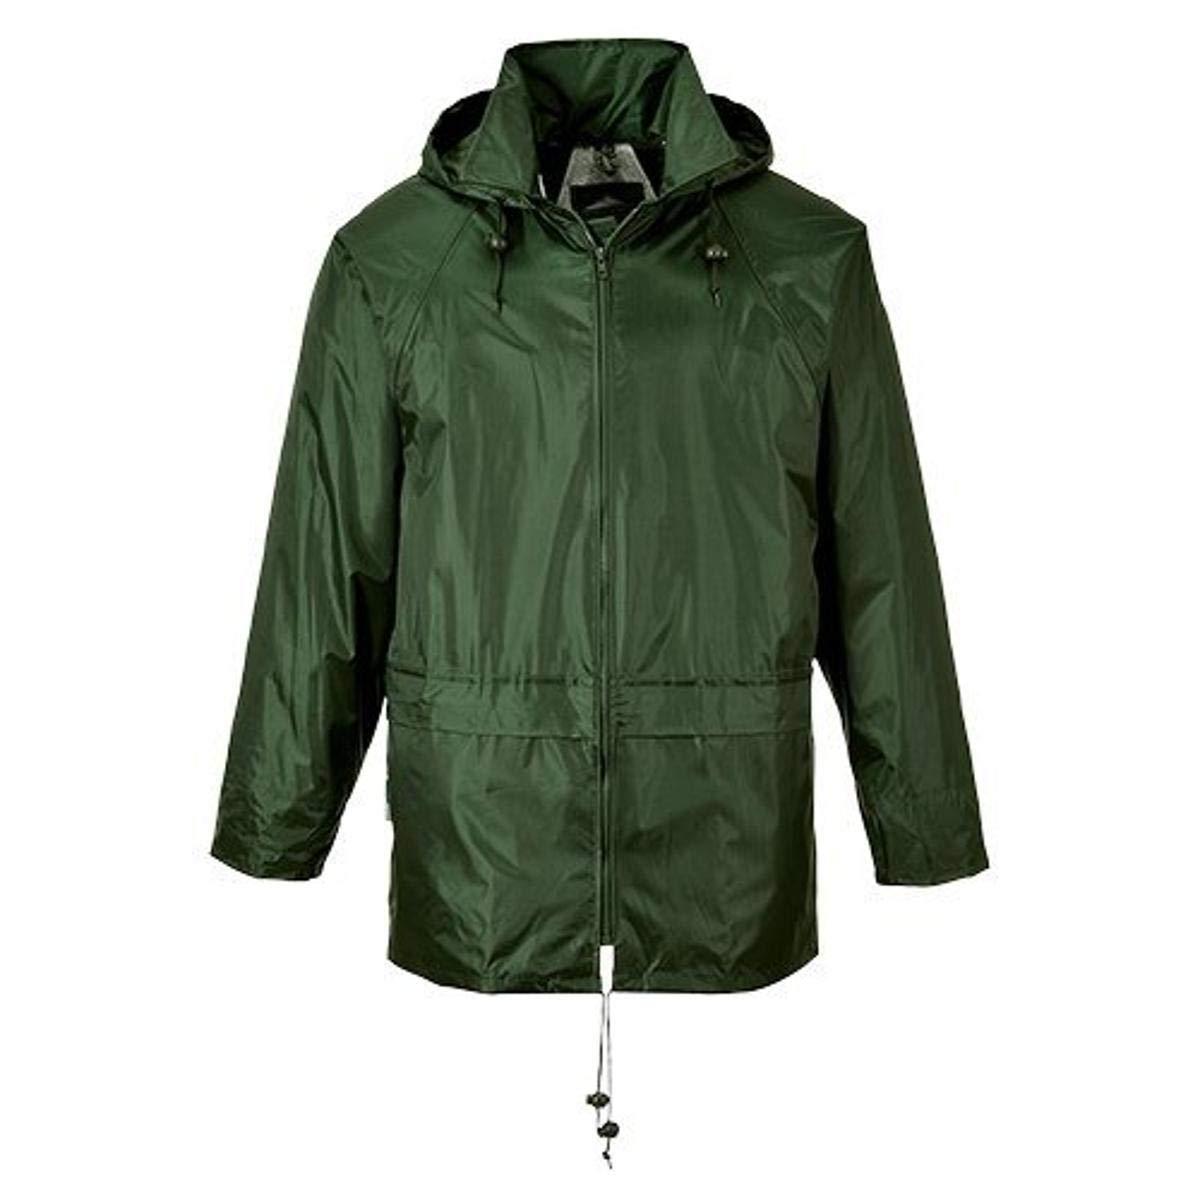 Portwest US440OGR5XL Classic Rain Jacket, Fabric, 5XL, Olive